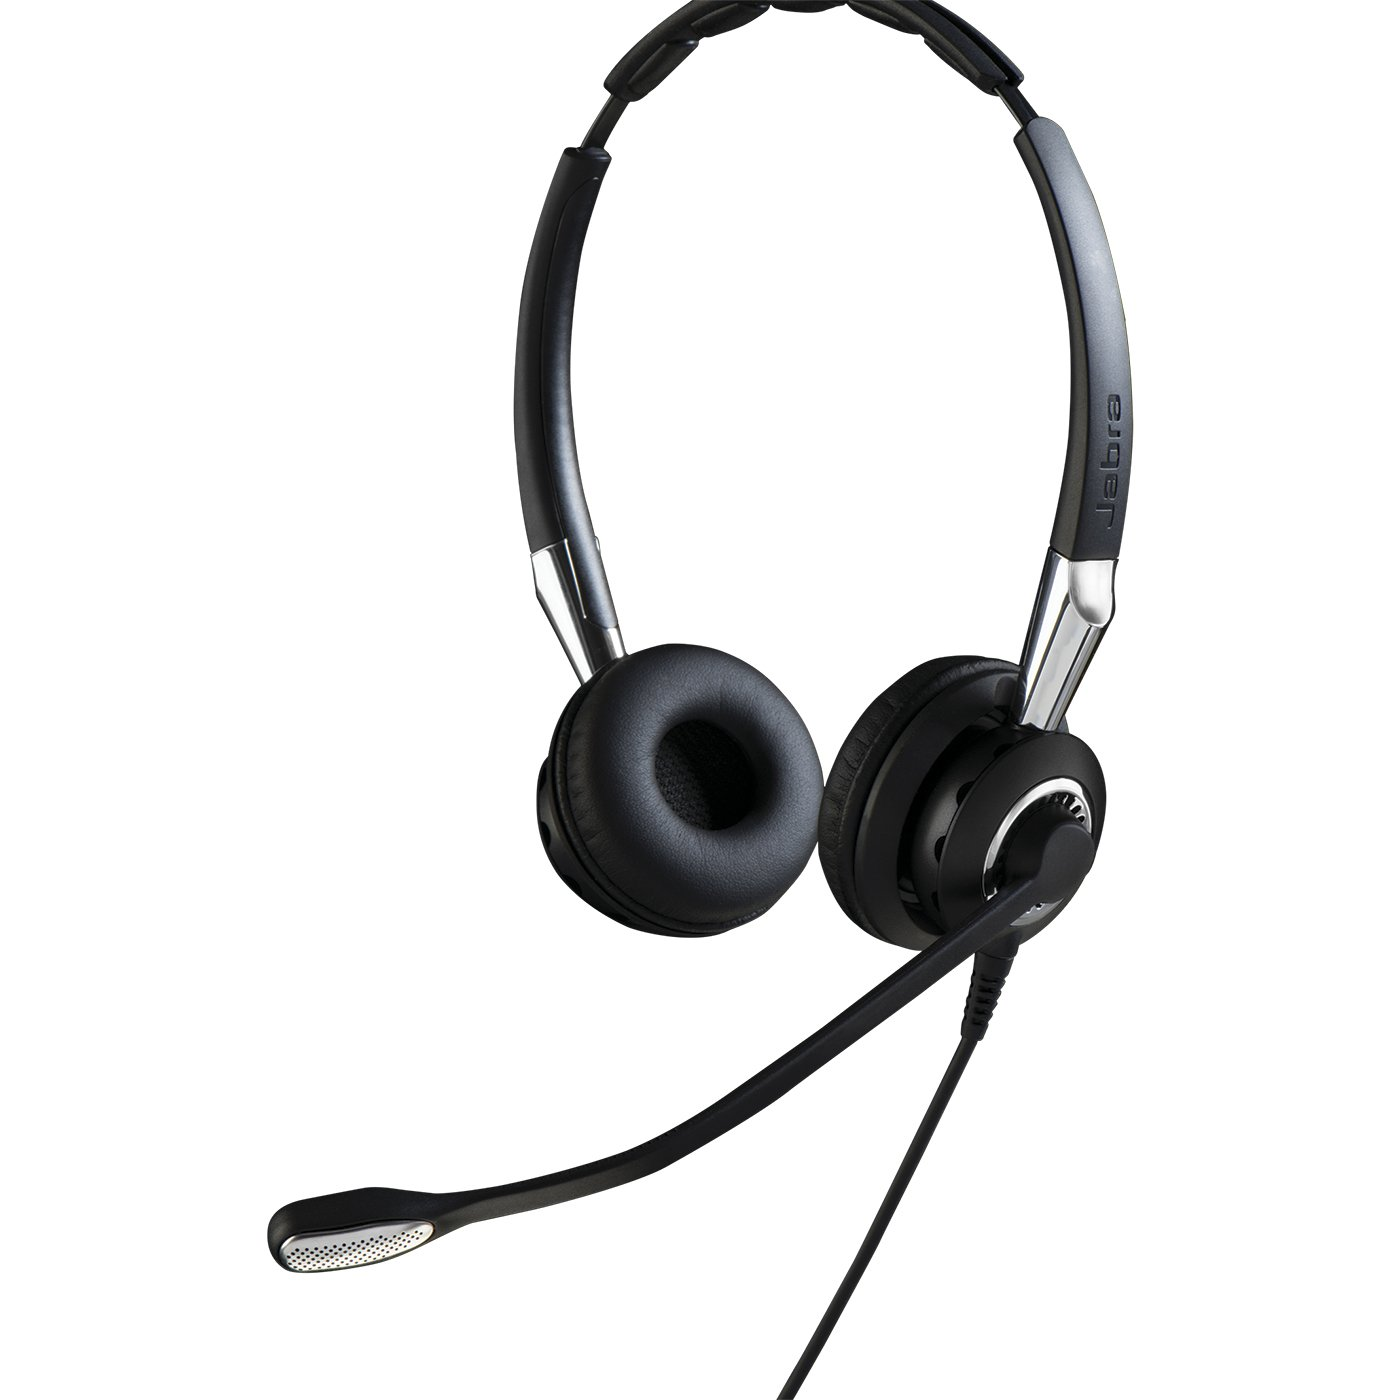 Jabra BIZ/™ 2400 II Duo Quick disconnect noise cancelling headset optimised for UC platforms